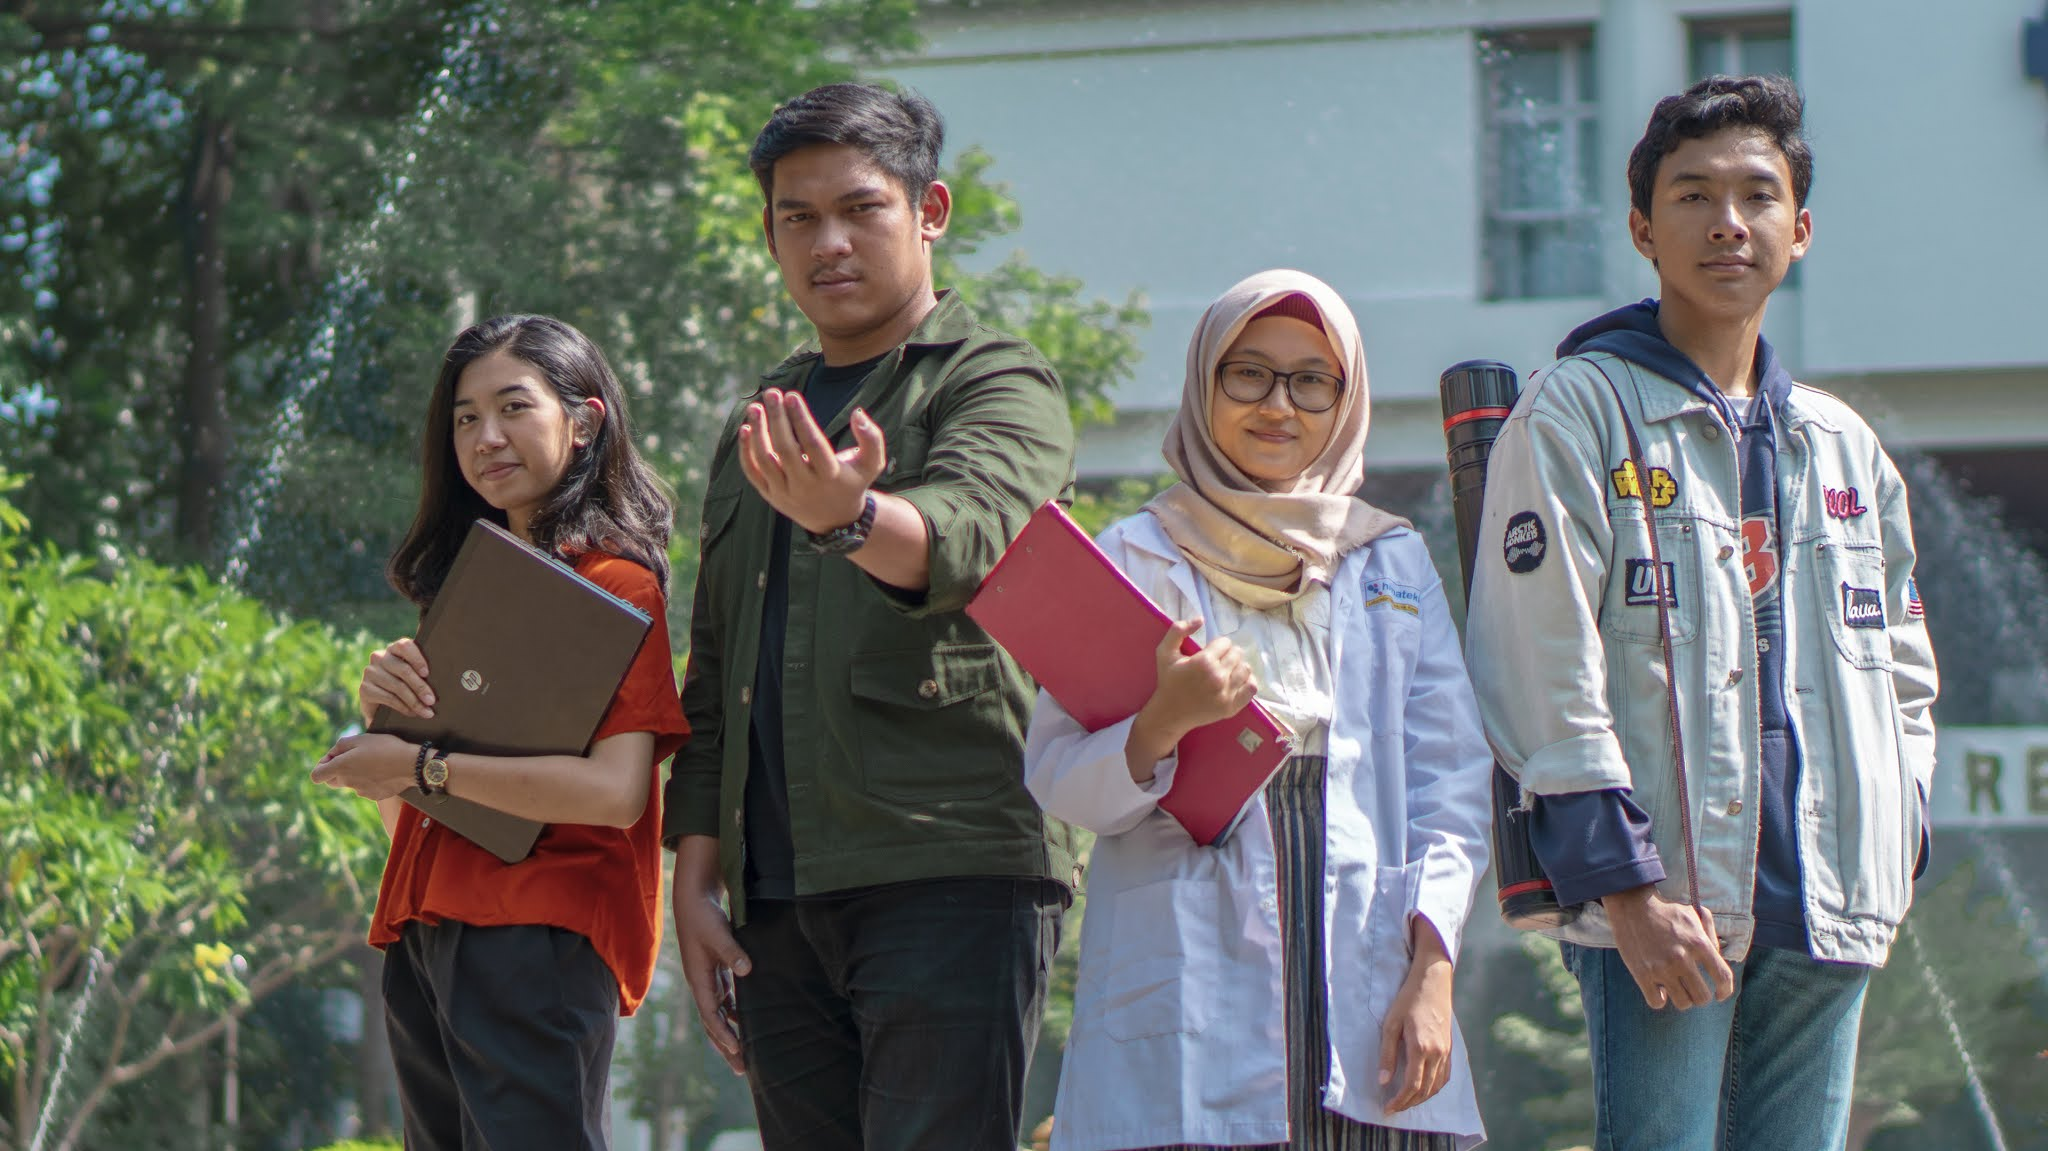 Institut Teknologi Sepuluh Nopember (ITS) International Programs